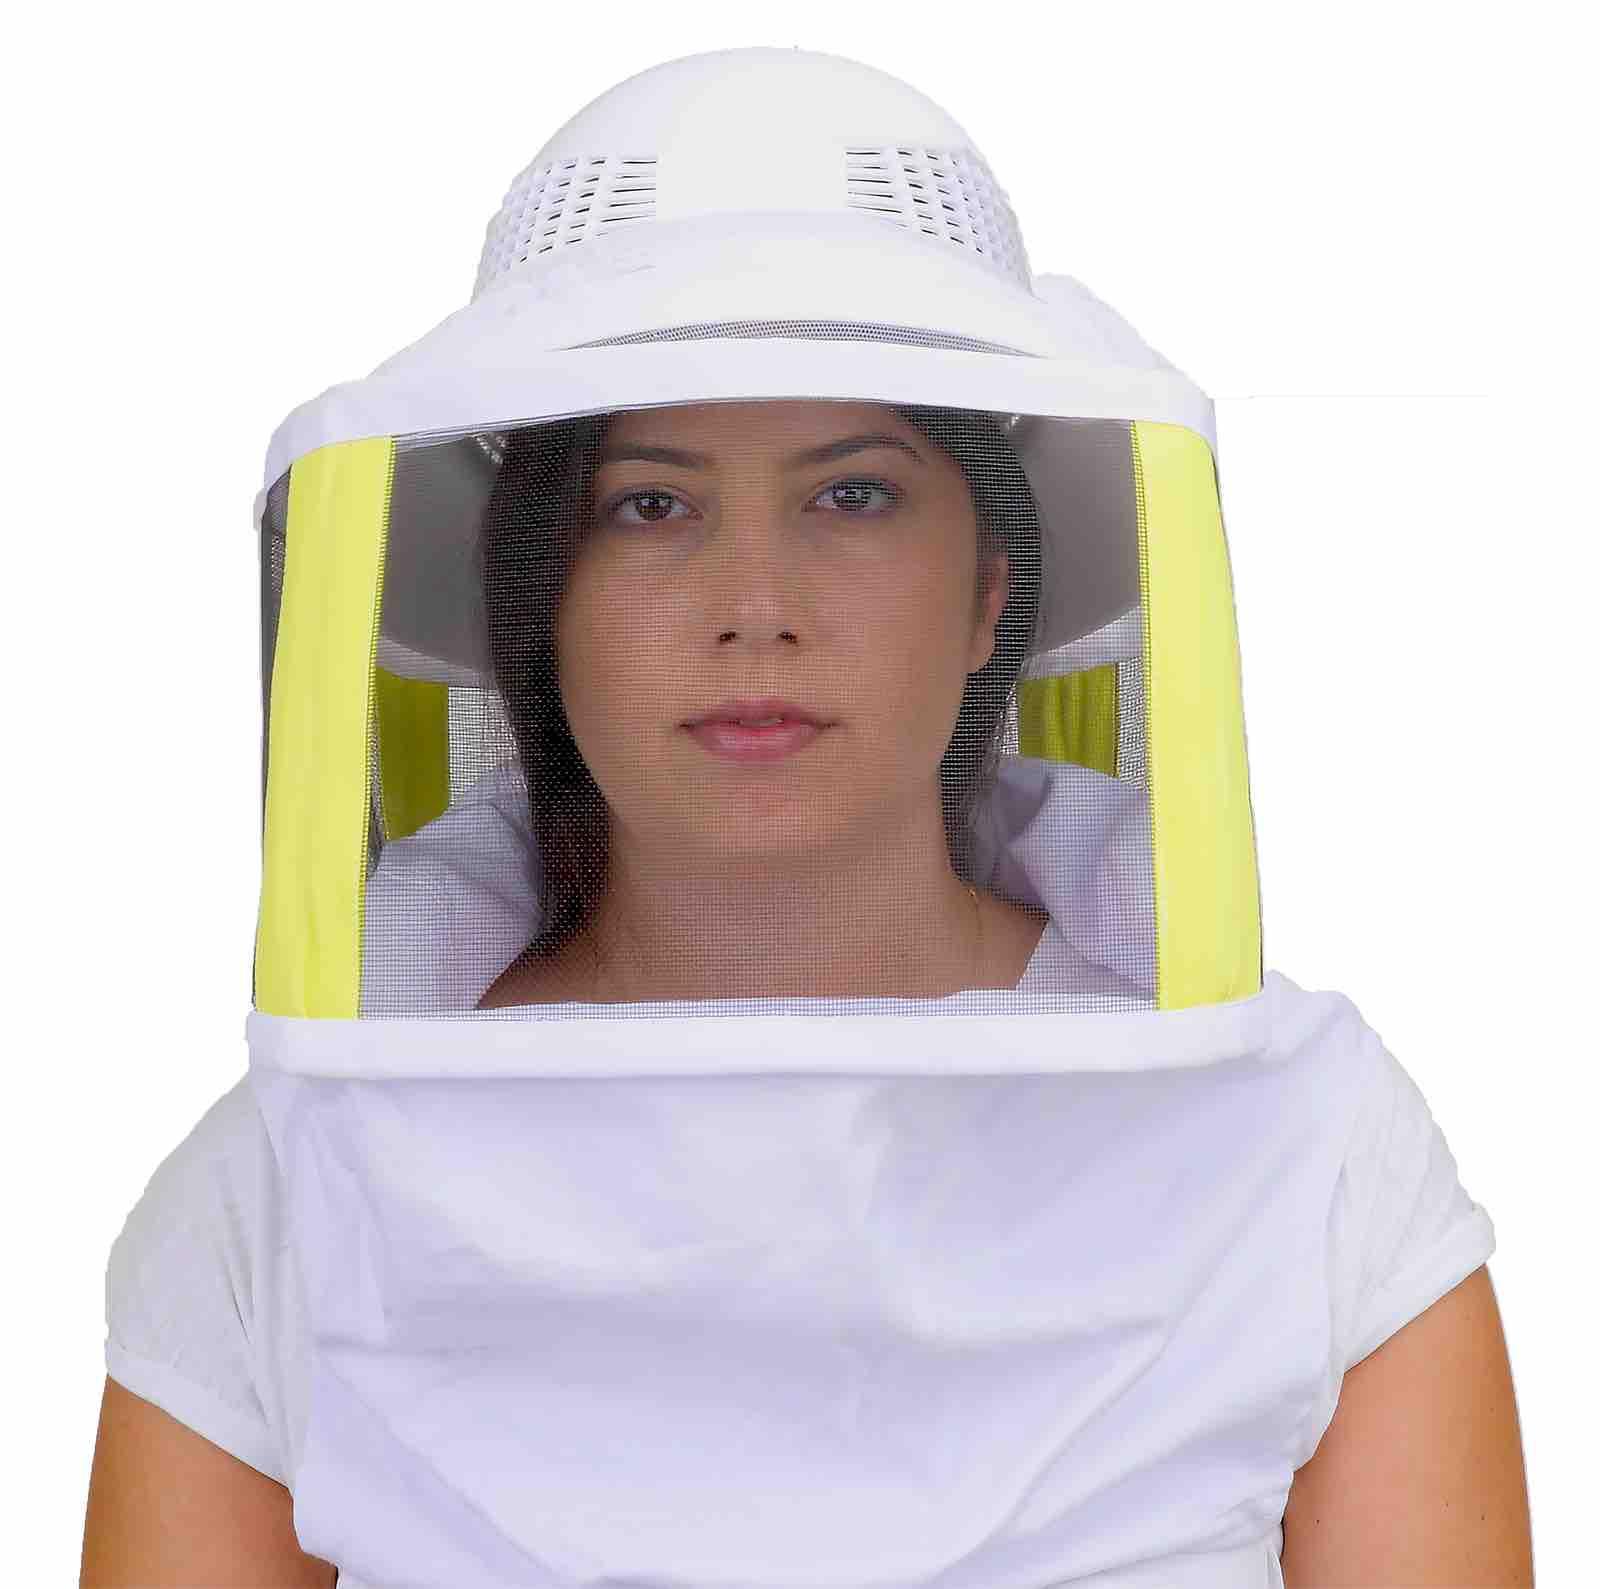 Beekeeping Plastic Helmet & Veil - with Shoulder Straps